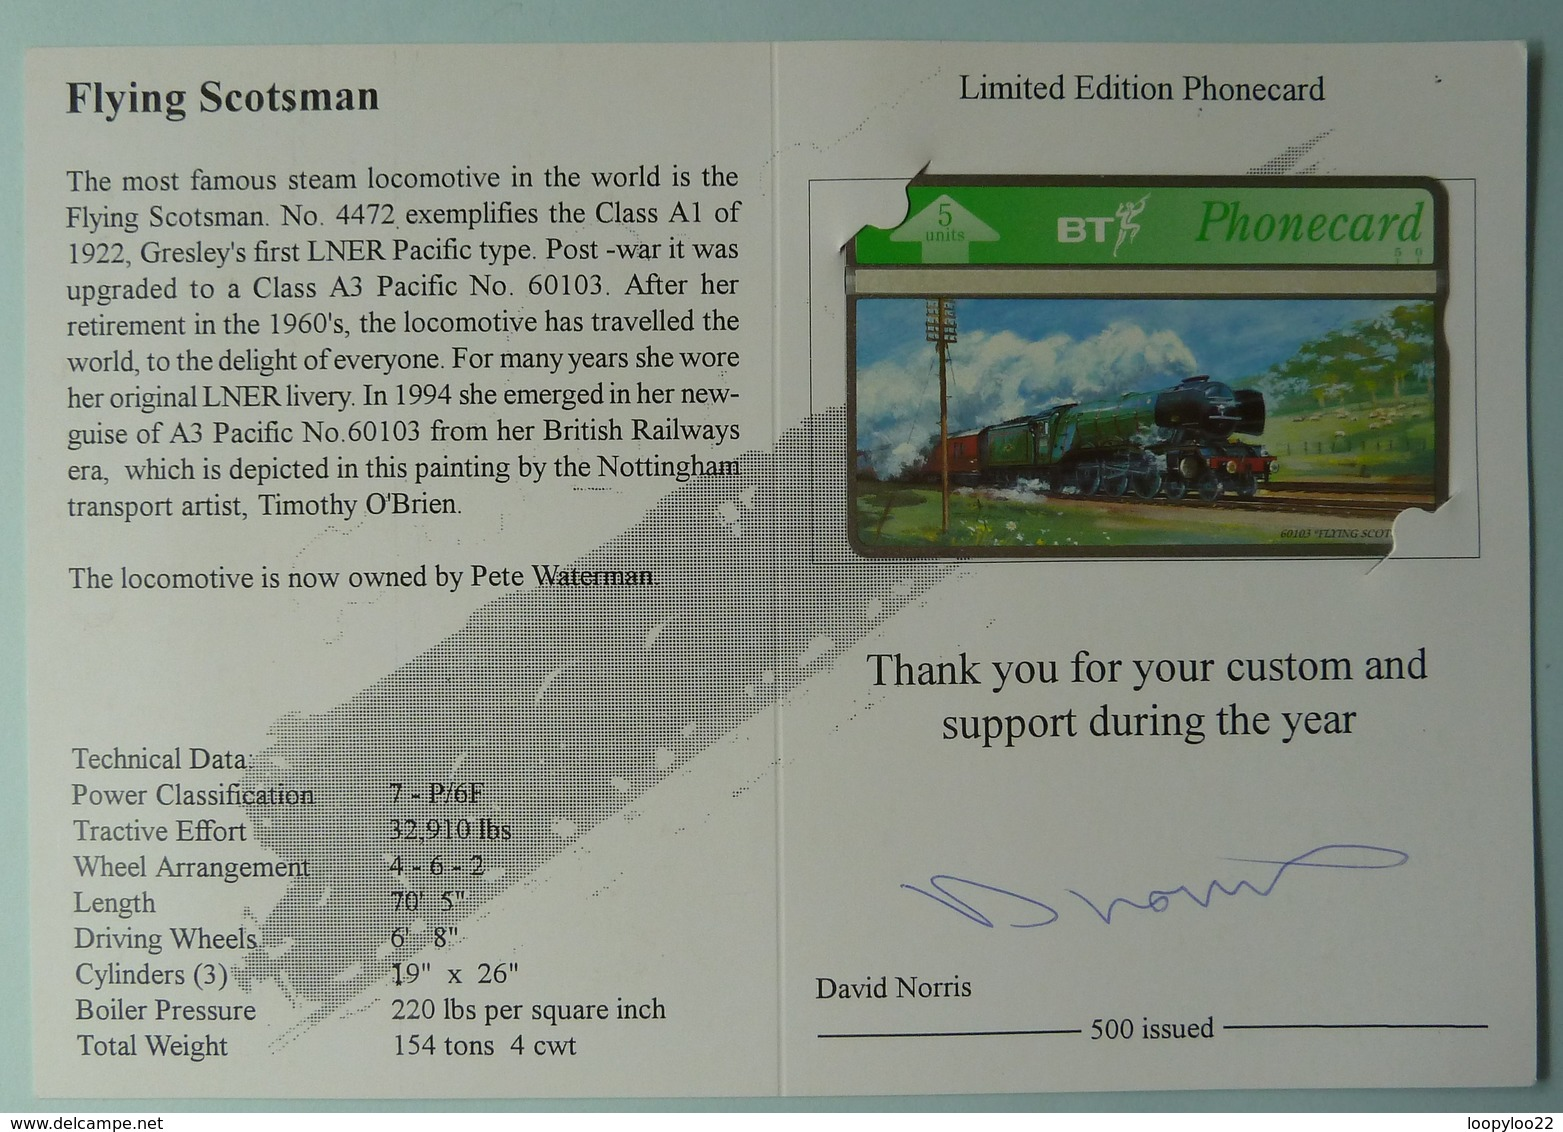 UK - BT - BTG446 - Flying Scotsman - DHN Phonecards - Limited Edition 500ex - Mint In Folder - BT General Issues